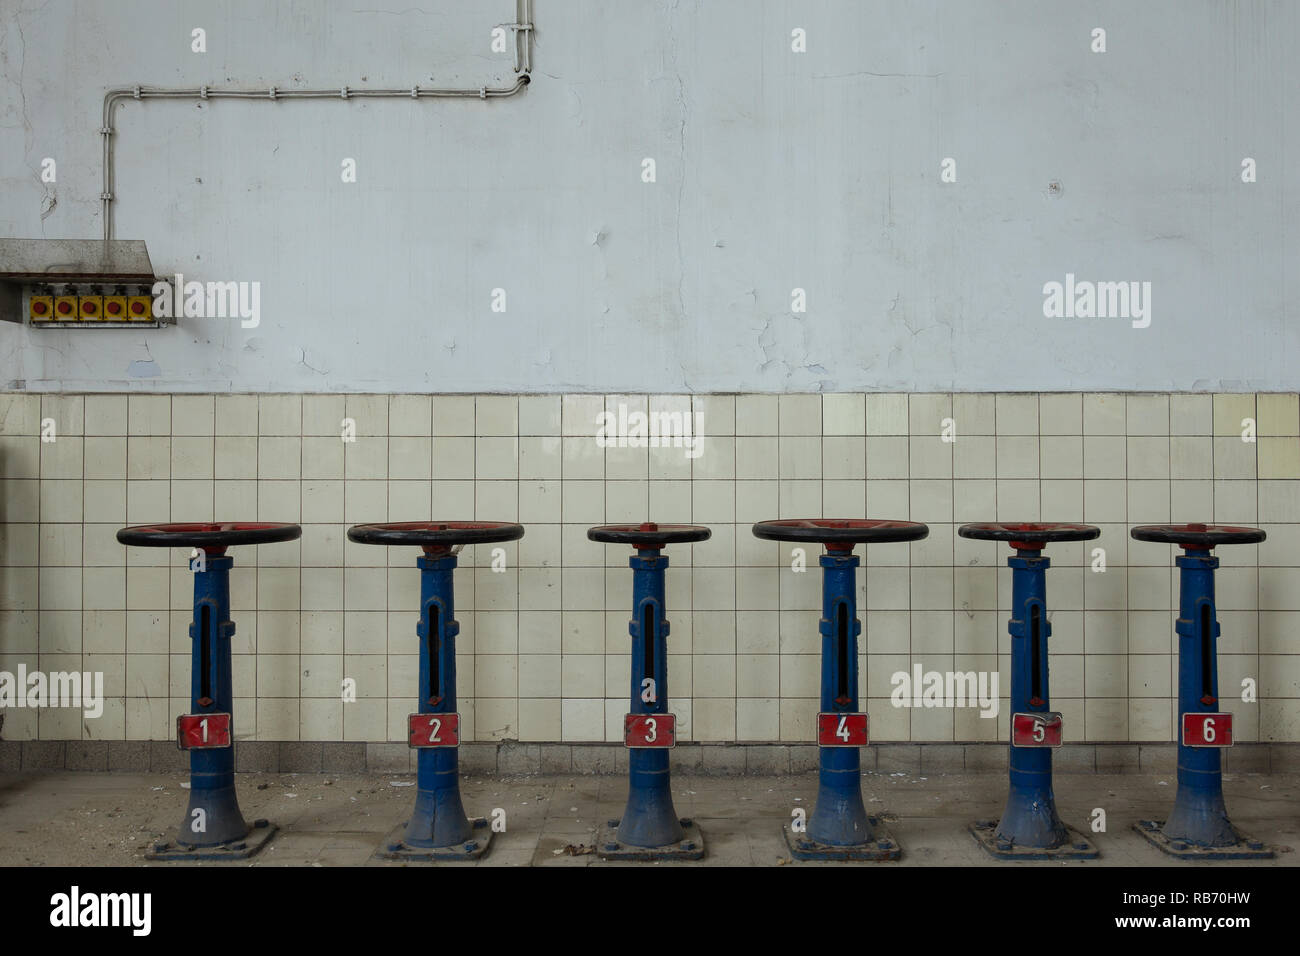 La energía perdida, abandonada powerplant Foto de stock